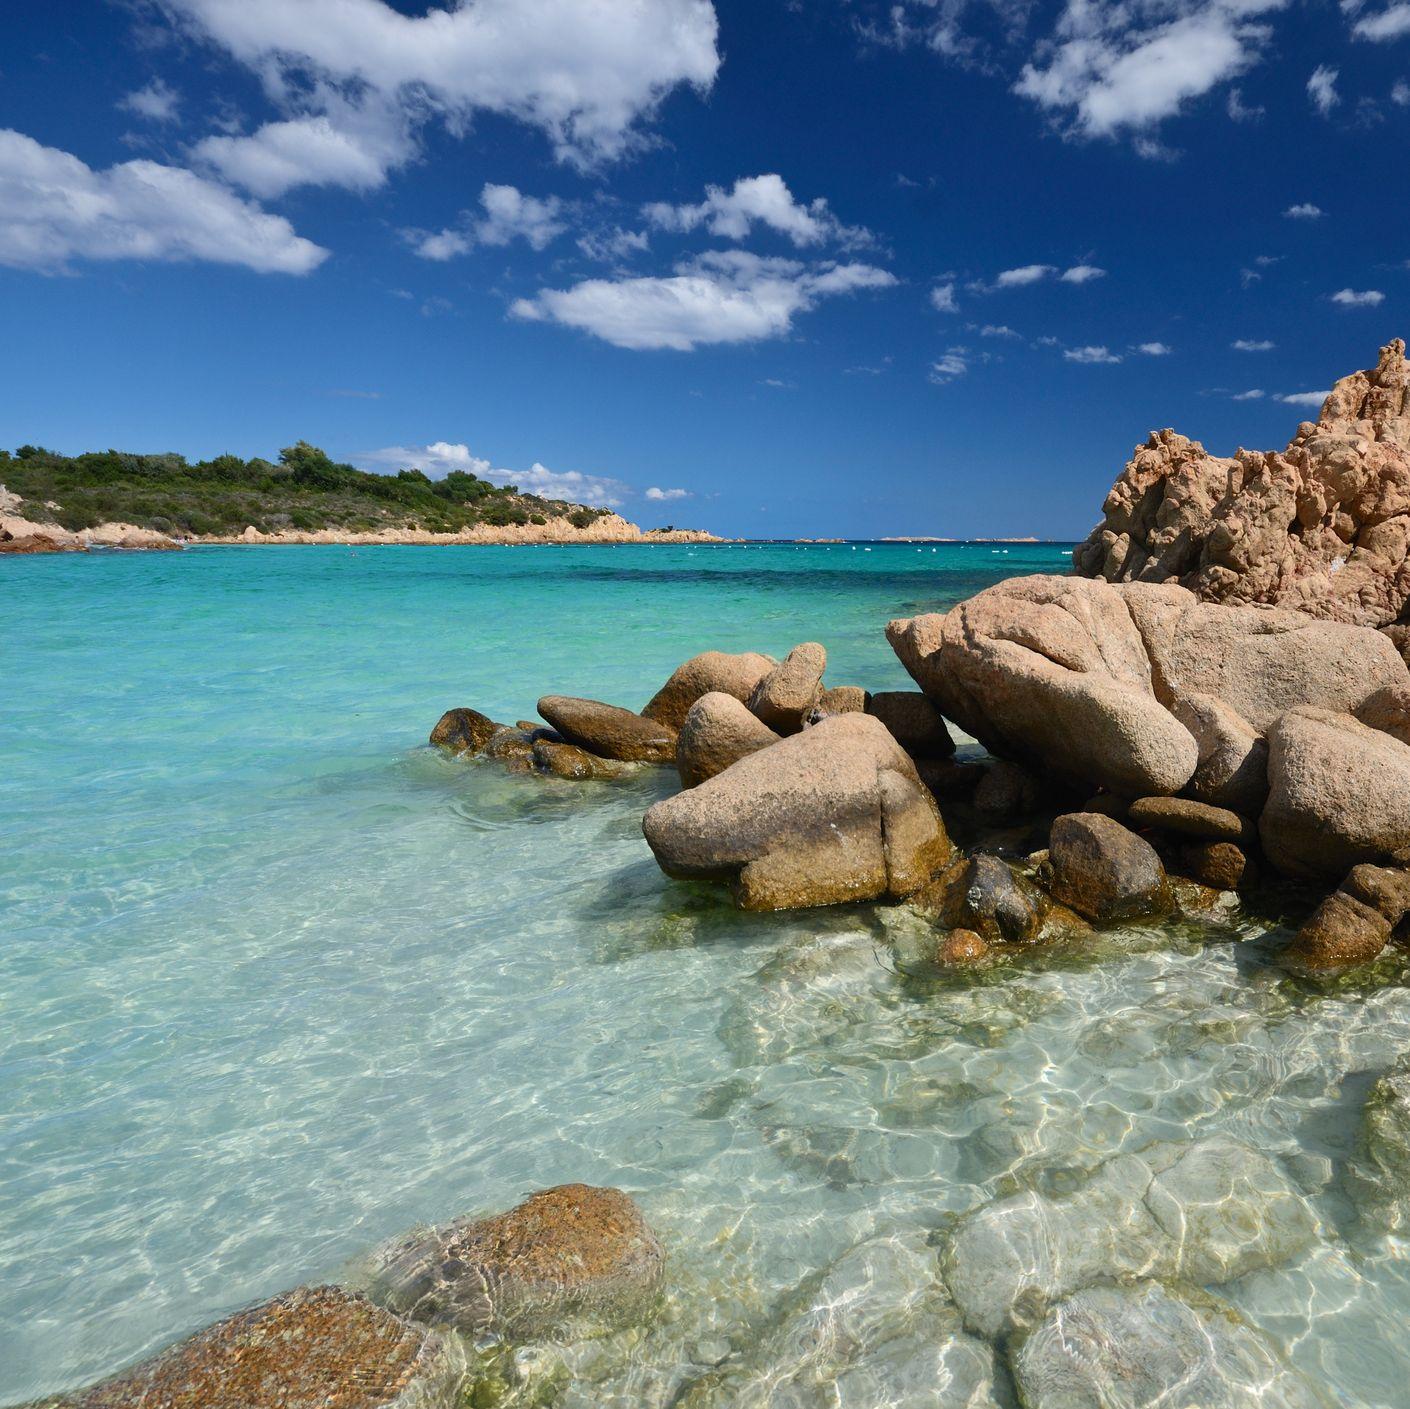 Beach holidays in Italy: Sardinia, Spiaggia del Principe